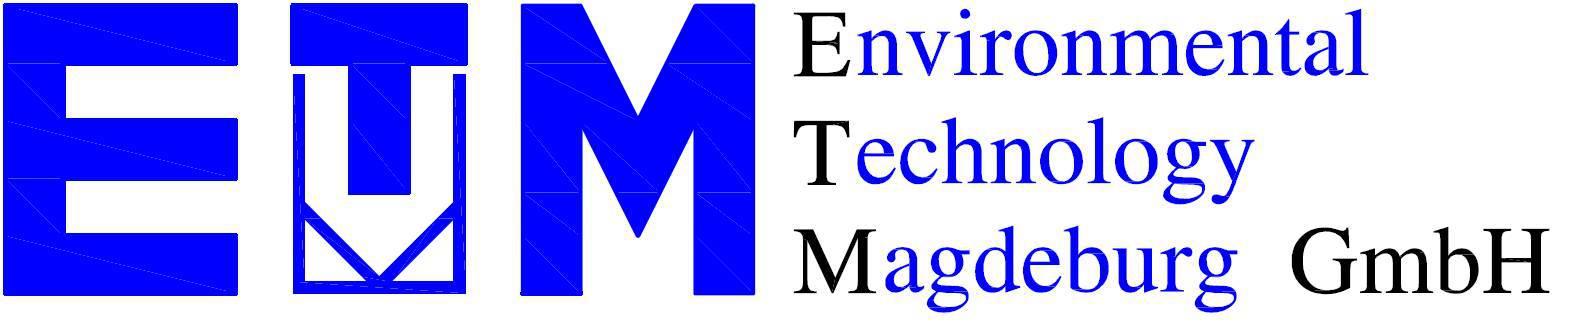 Firmenlogo Environmental Technology Magdeburg GmbH - Entstaubungsanlagen